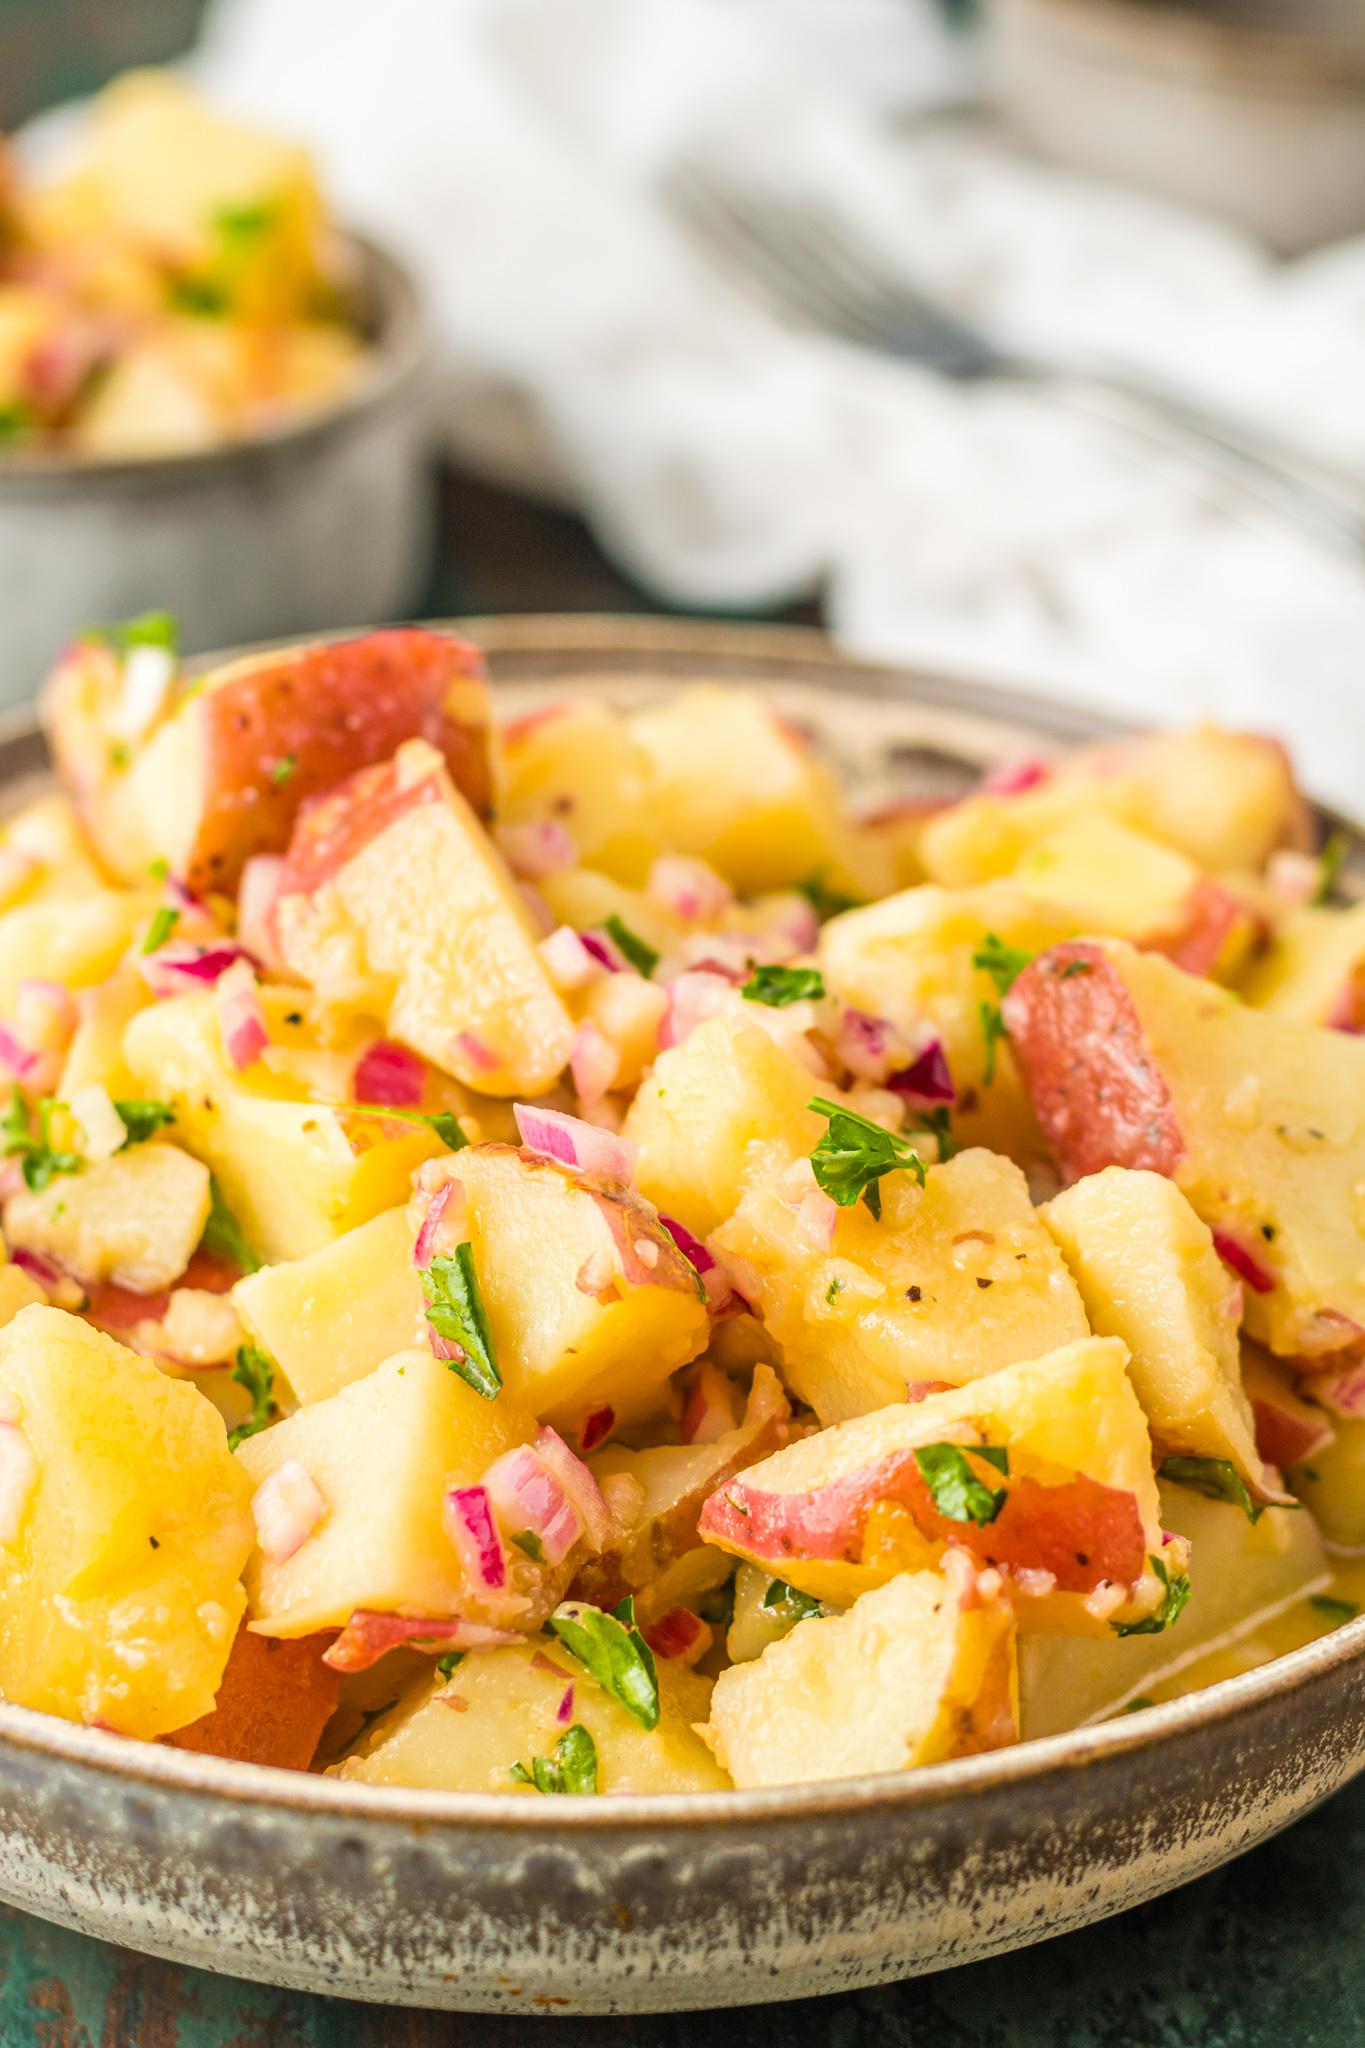 German Potato Salad Recipe with parsley.